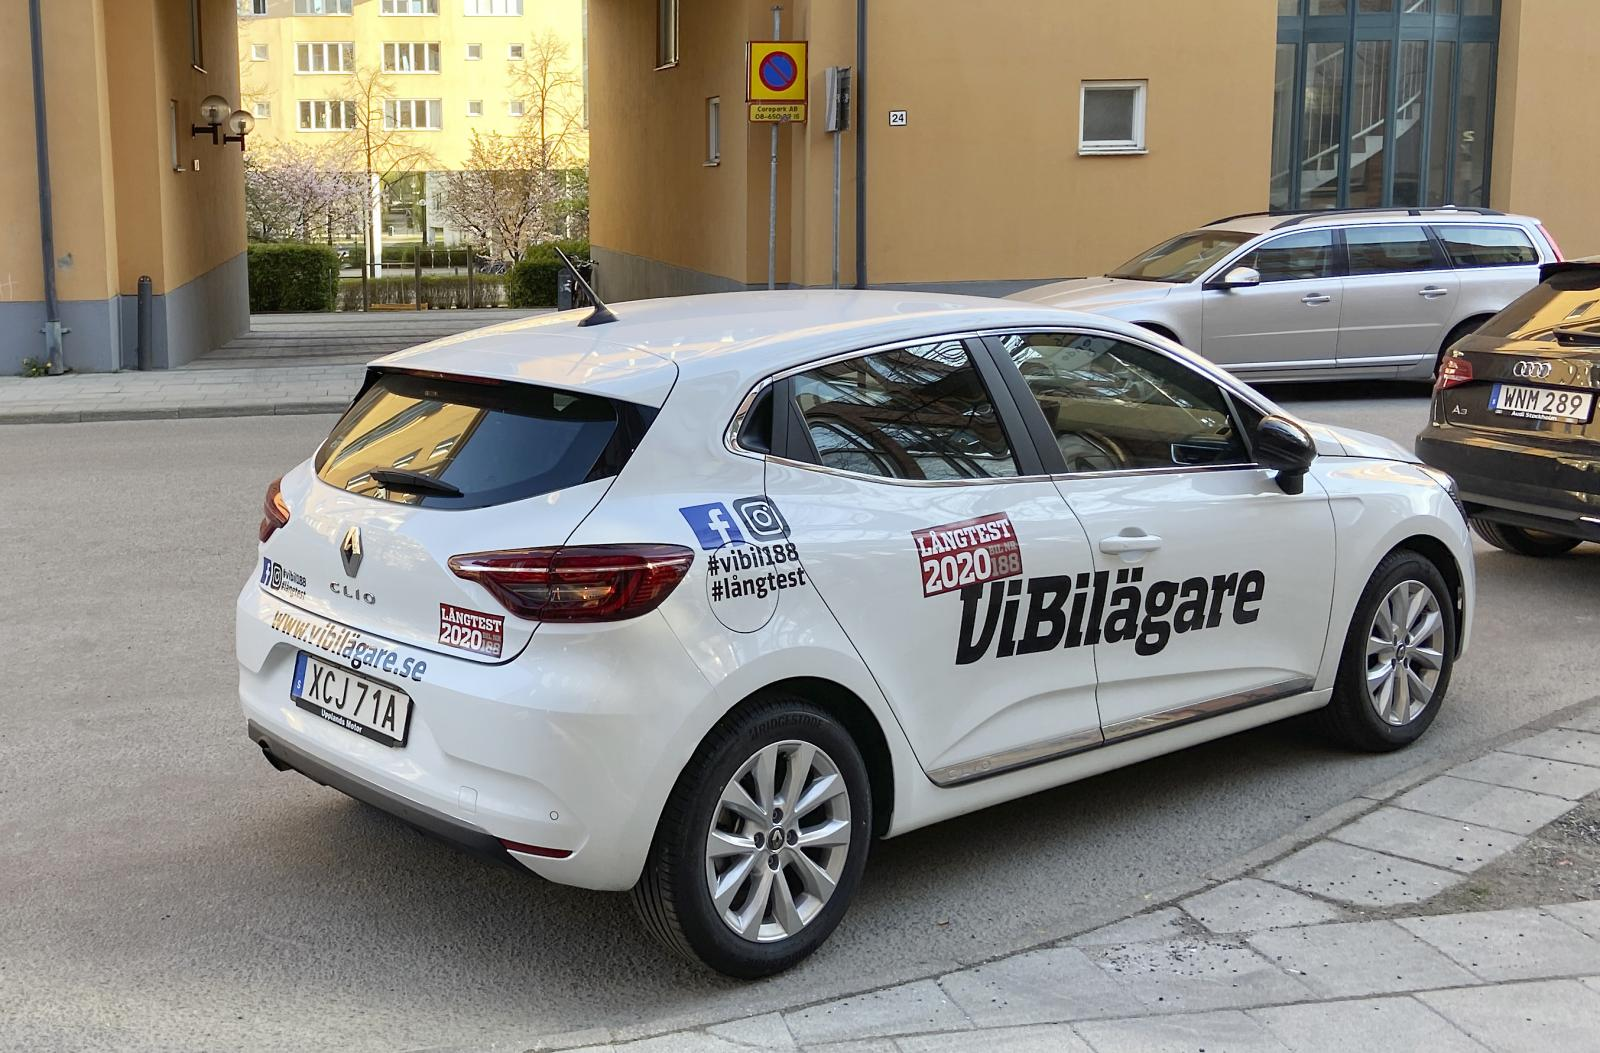 Långtest: Renault Clio (2020)